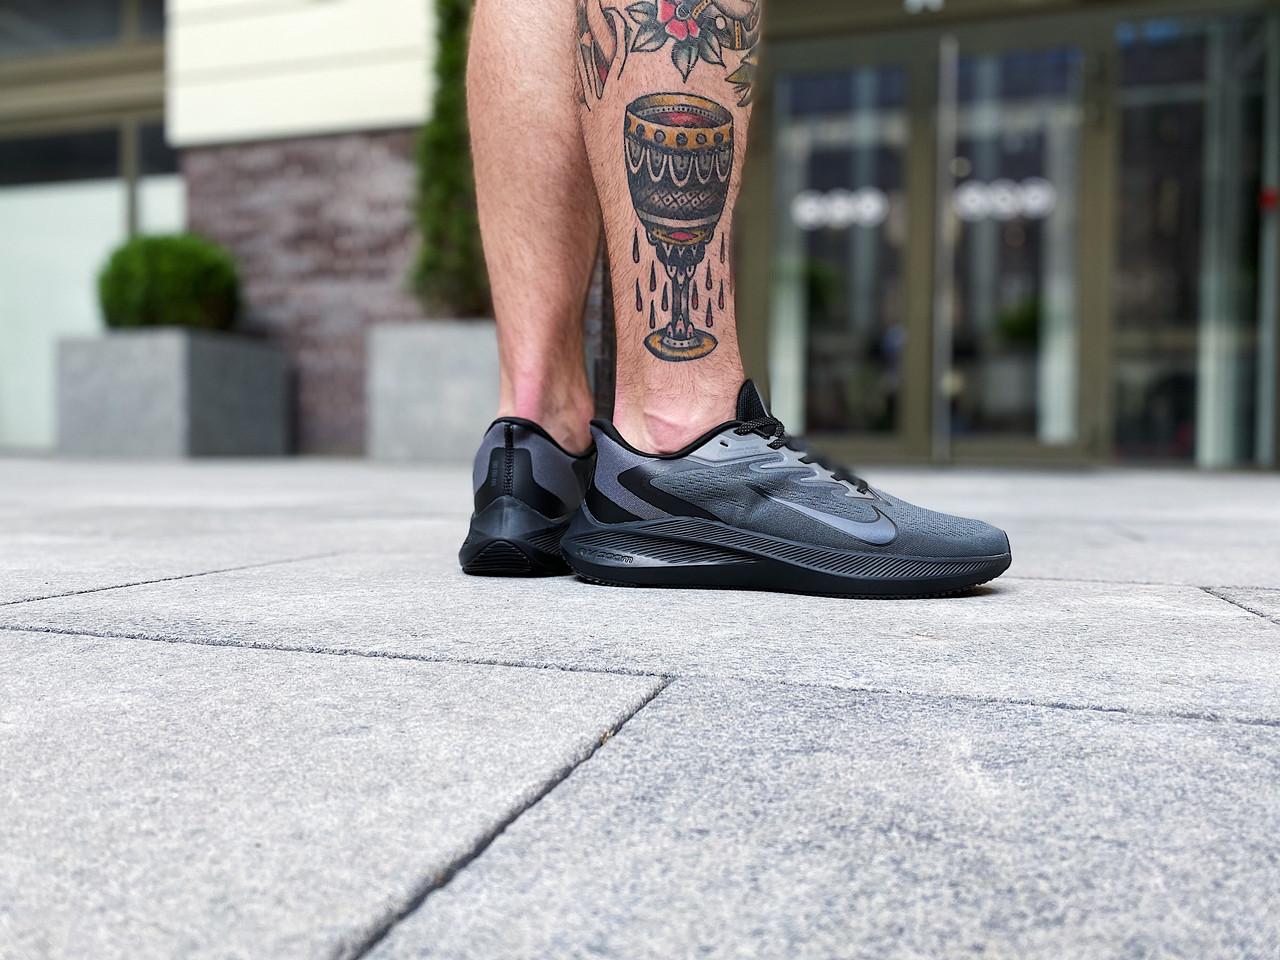 Кроссовки мужские Nike Zoom Winflo 7 / CJ0291-077 (Размеры:41,44)